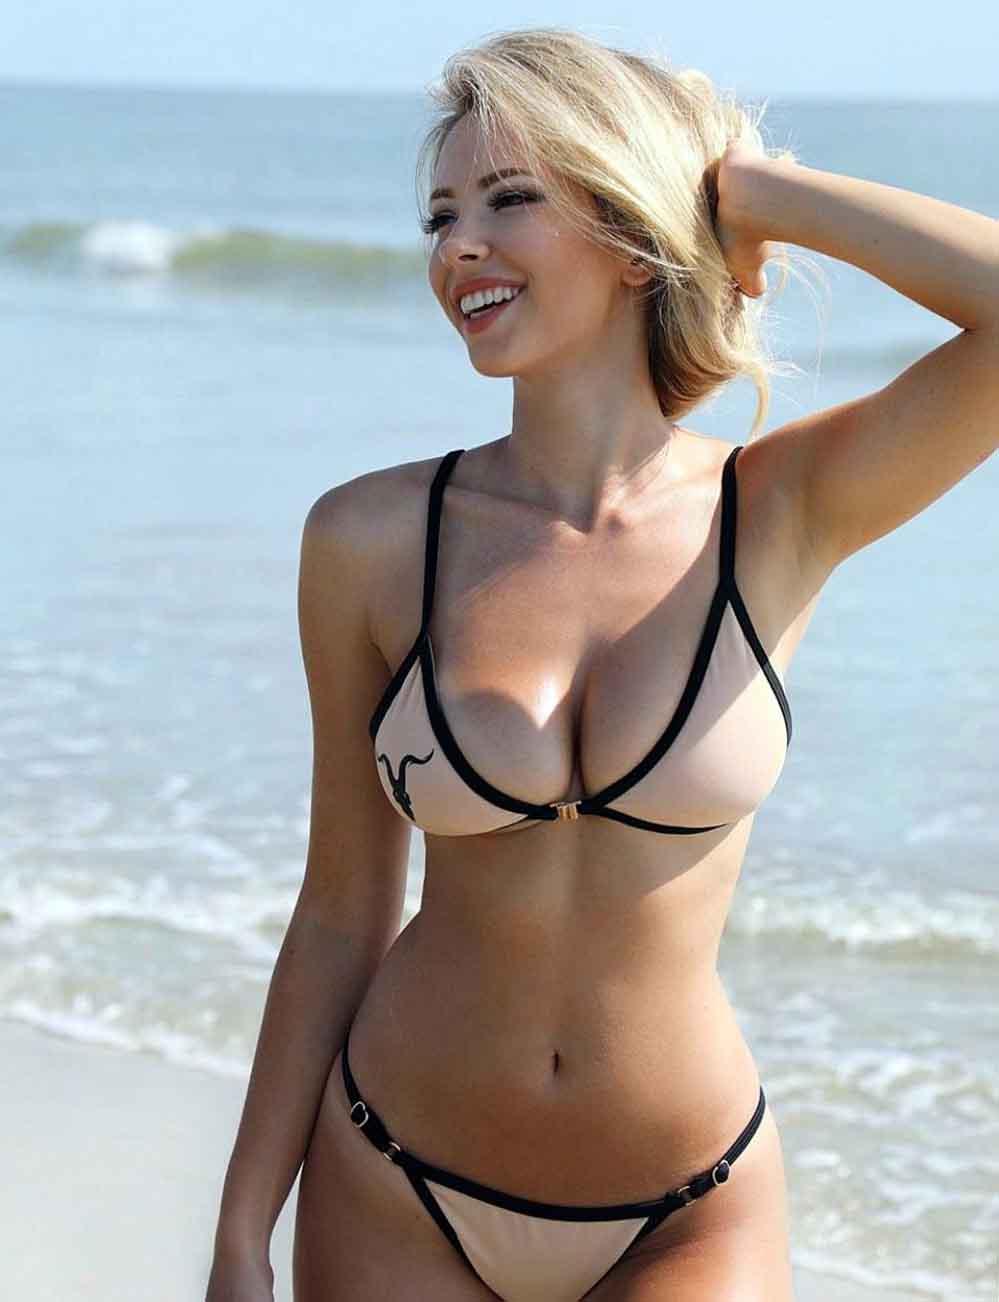 sexy slovenian girl pic 2